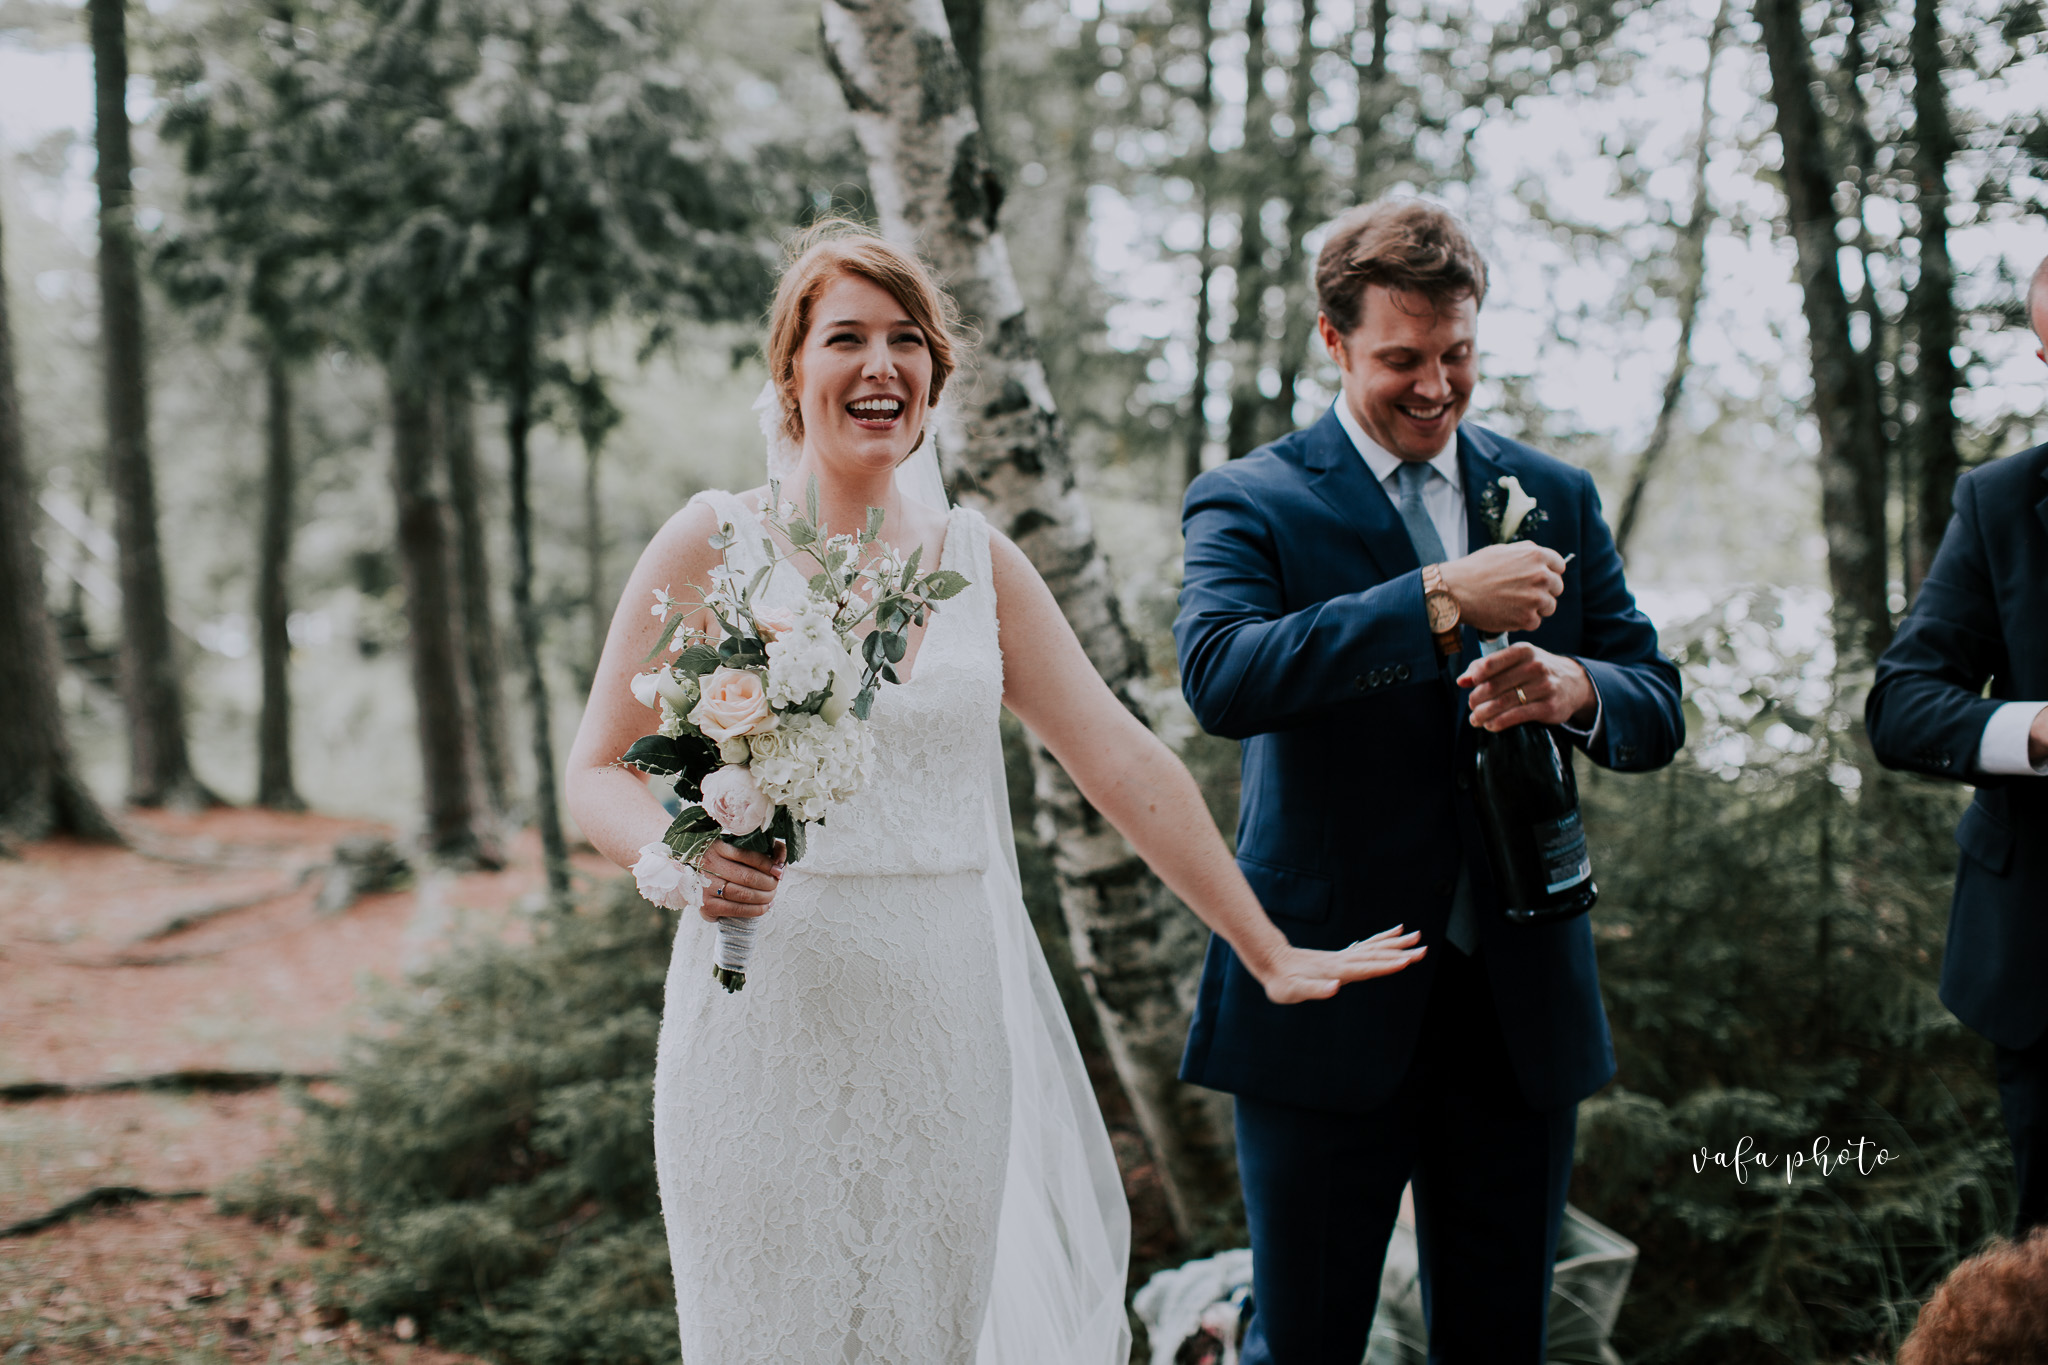 Michigan-Lake-House-Wedding-Madeline-Patrick-Vafa-Photo-385.jpg